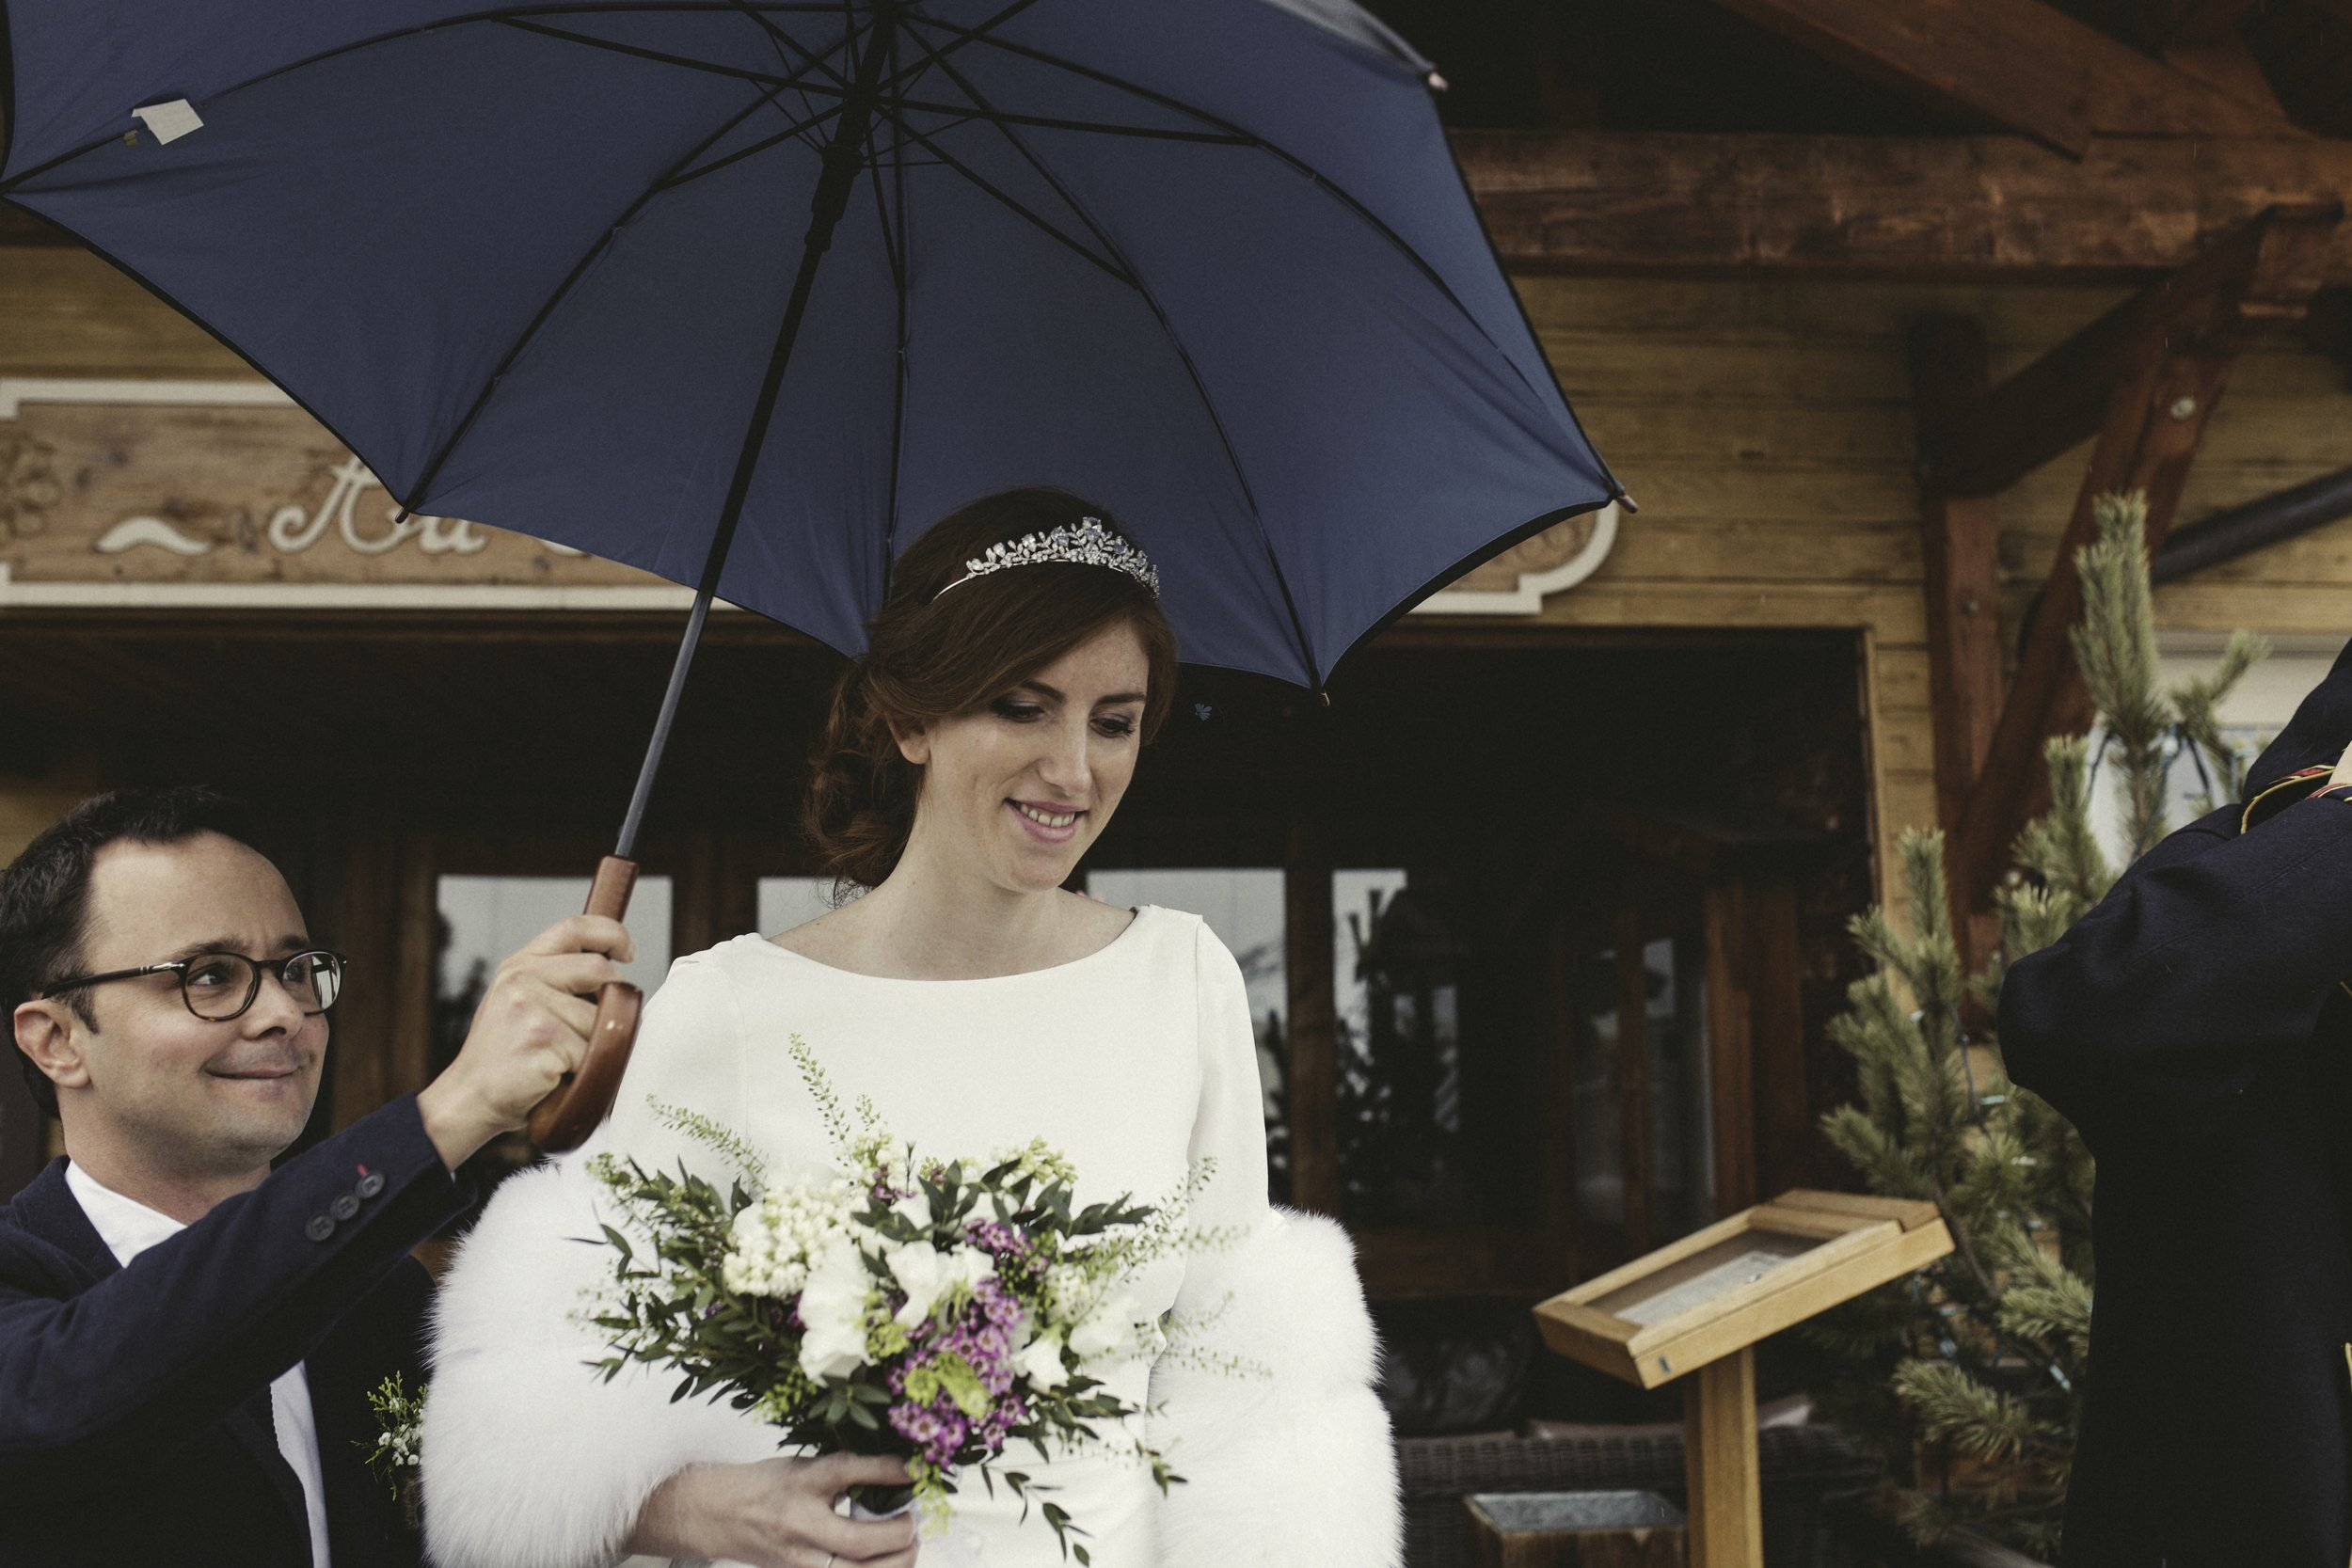 Mariage Mathilde et Guillaume, Alpe d'Huez